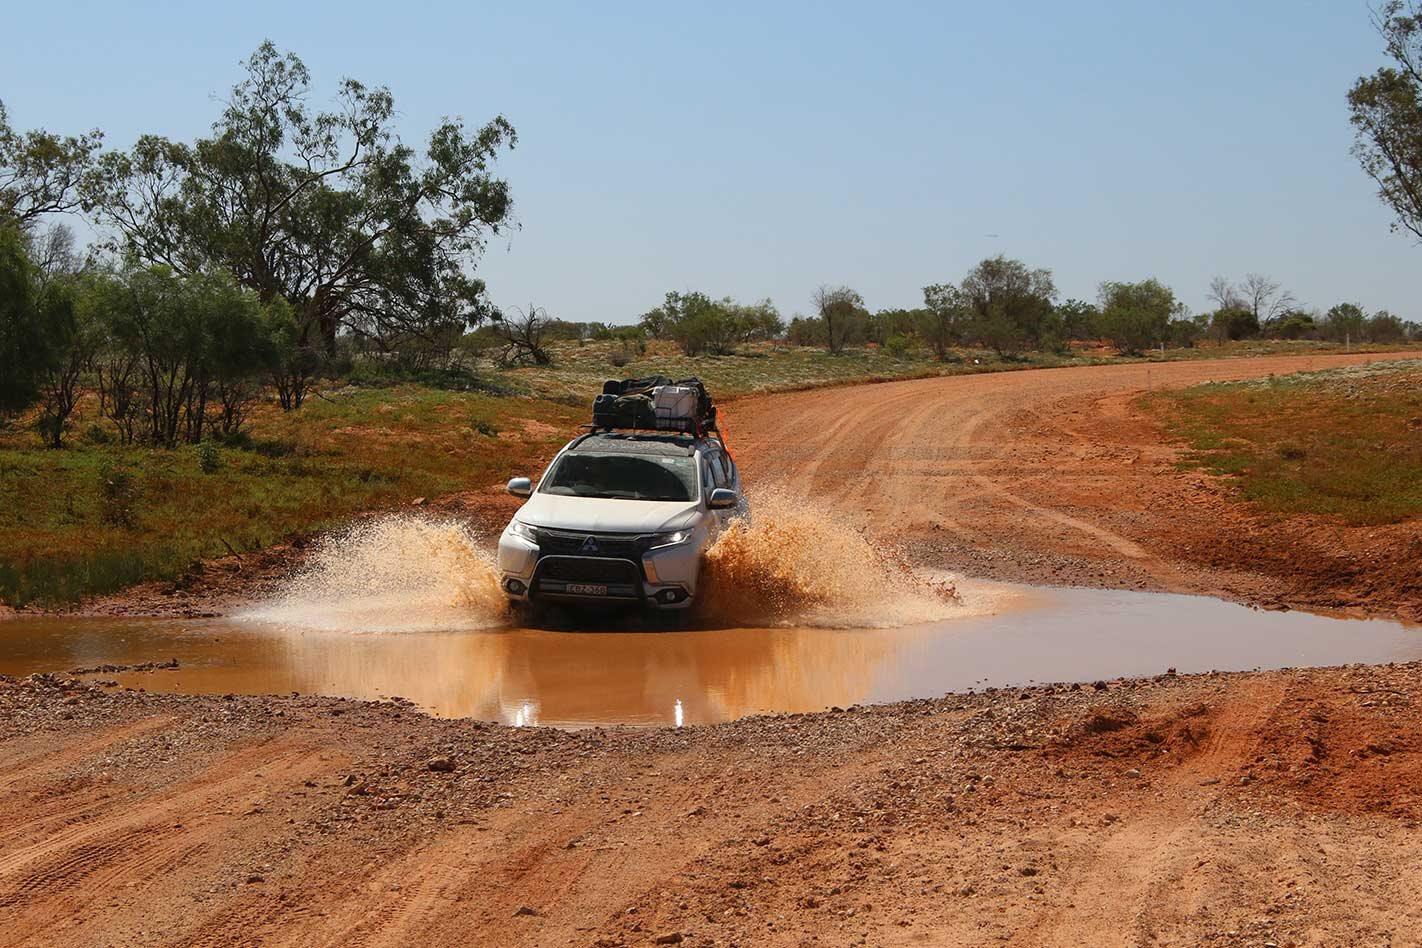 Darling River run